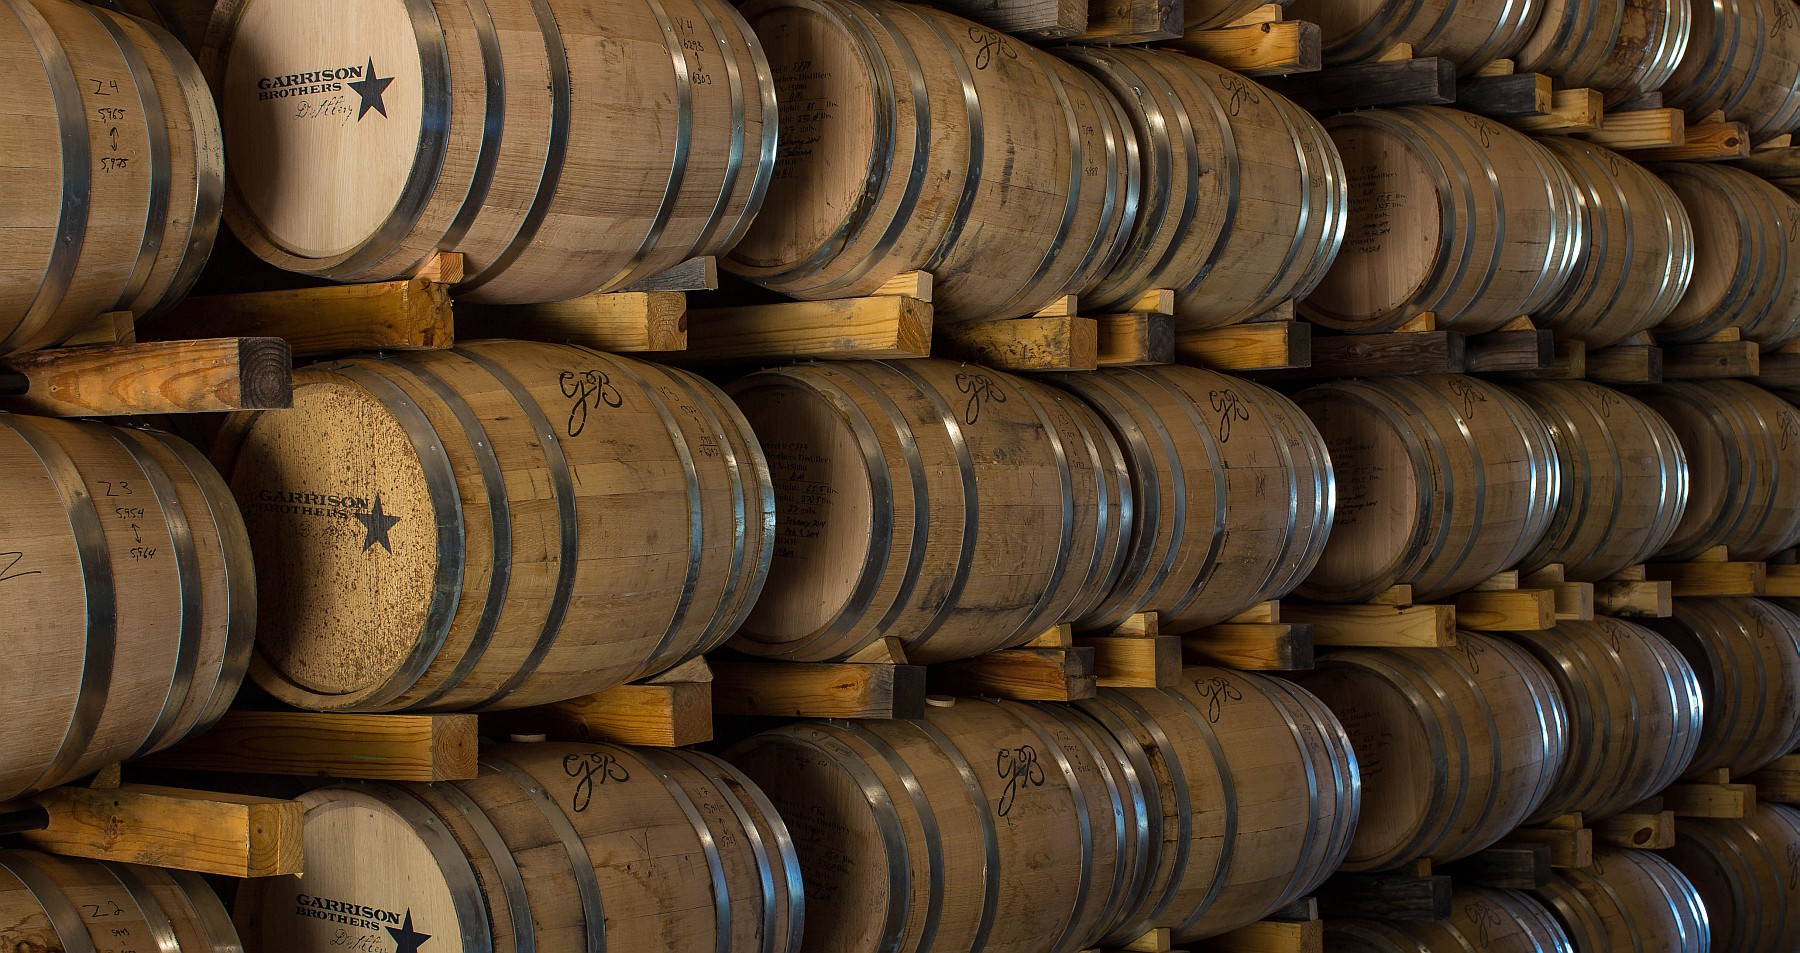 Garrison Brothers barrels